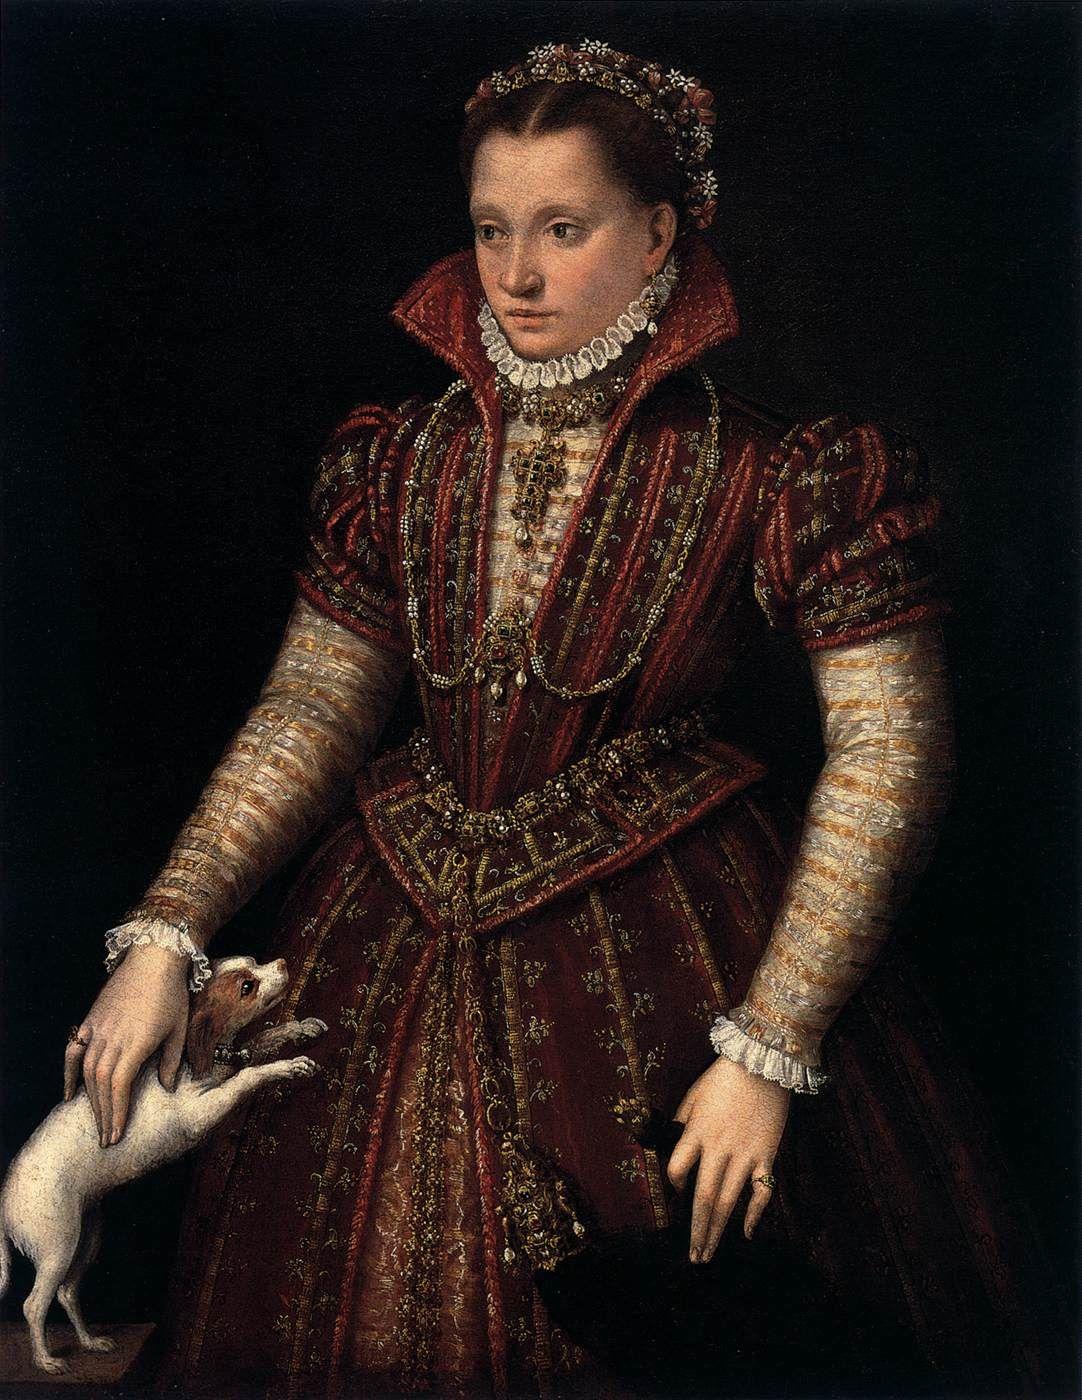 FONTANA, Lavinia. Portrait of a Noblewoman c. 1580. Oil on